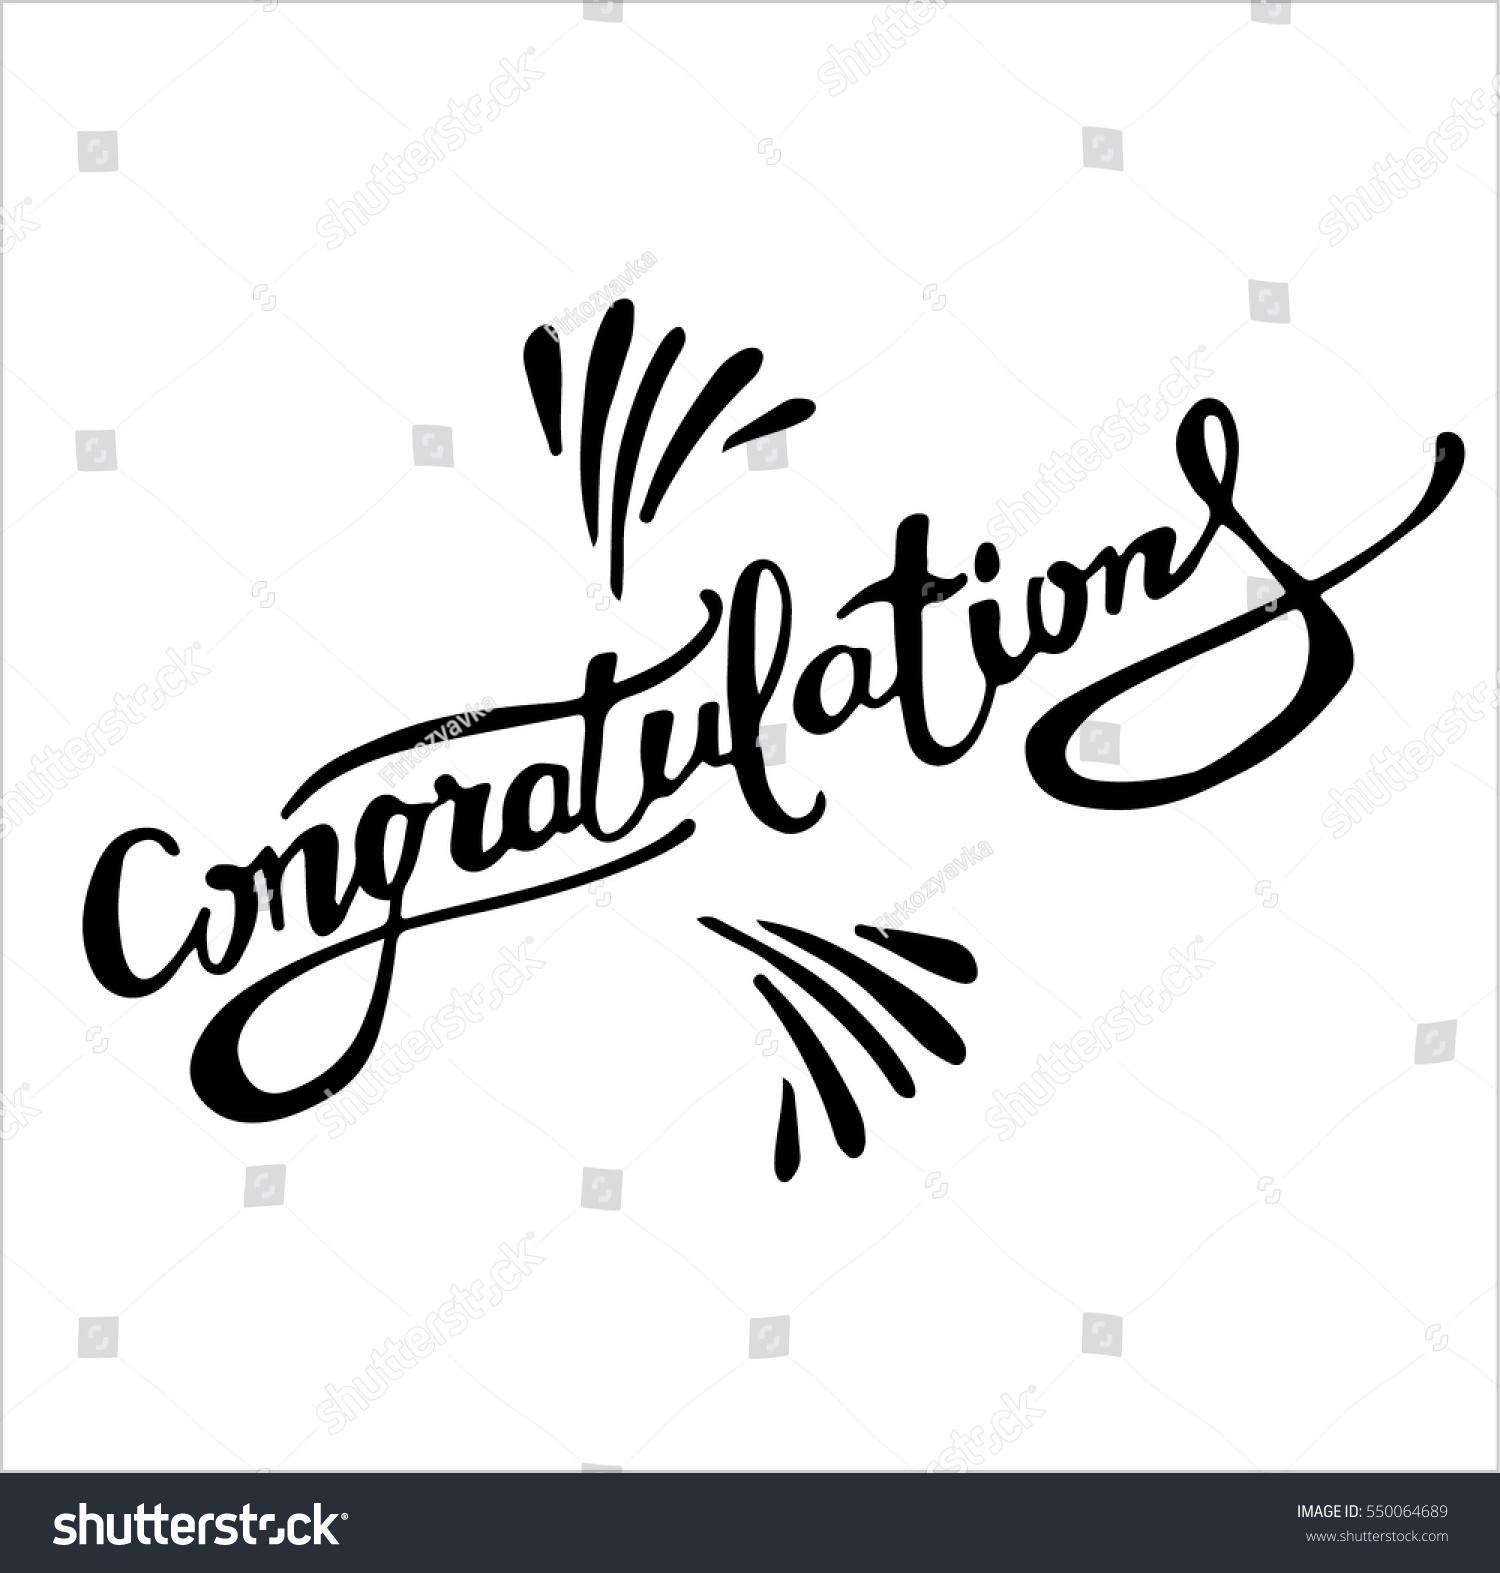 Congratulations calligraphy hand written text lettering